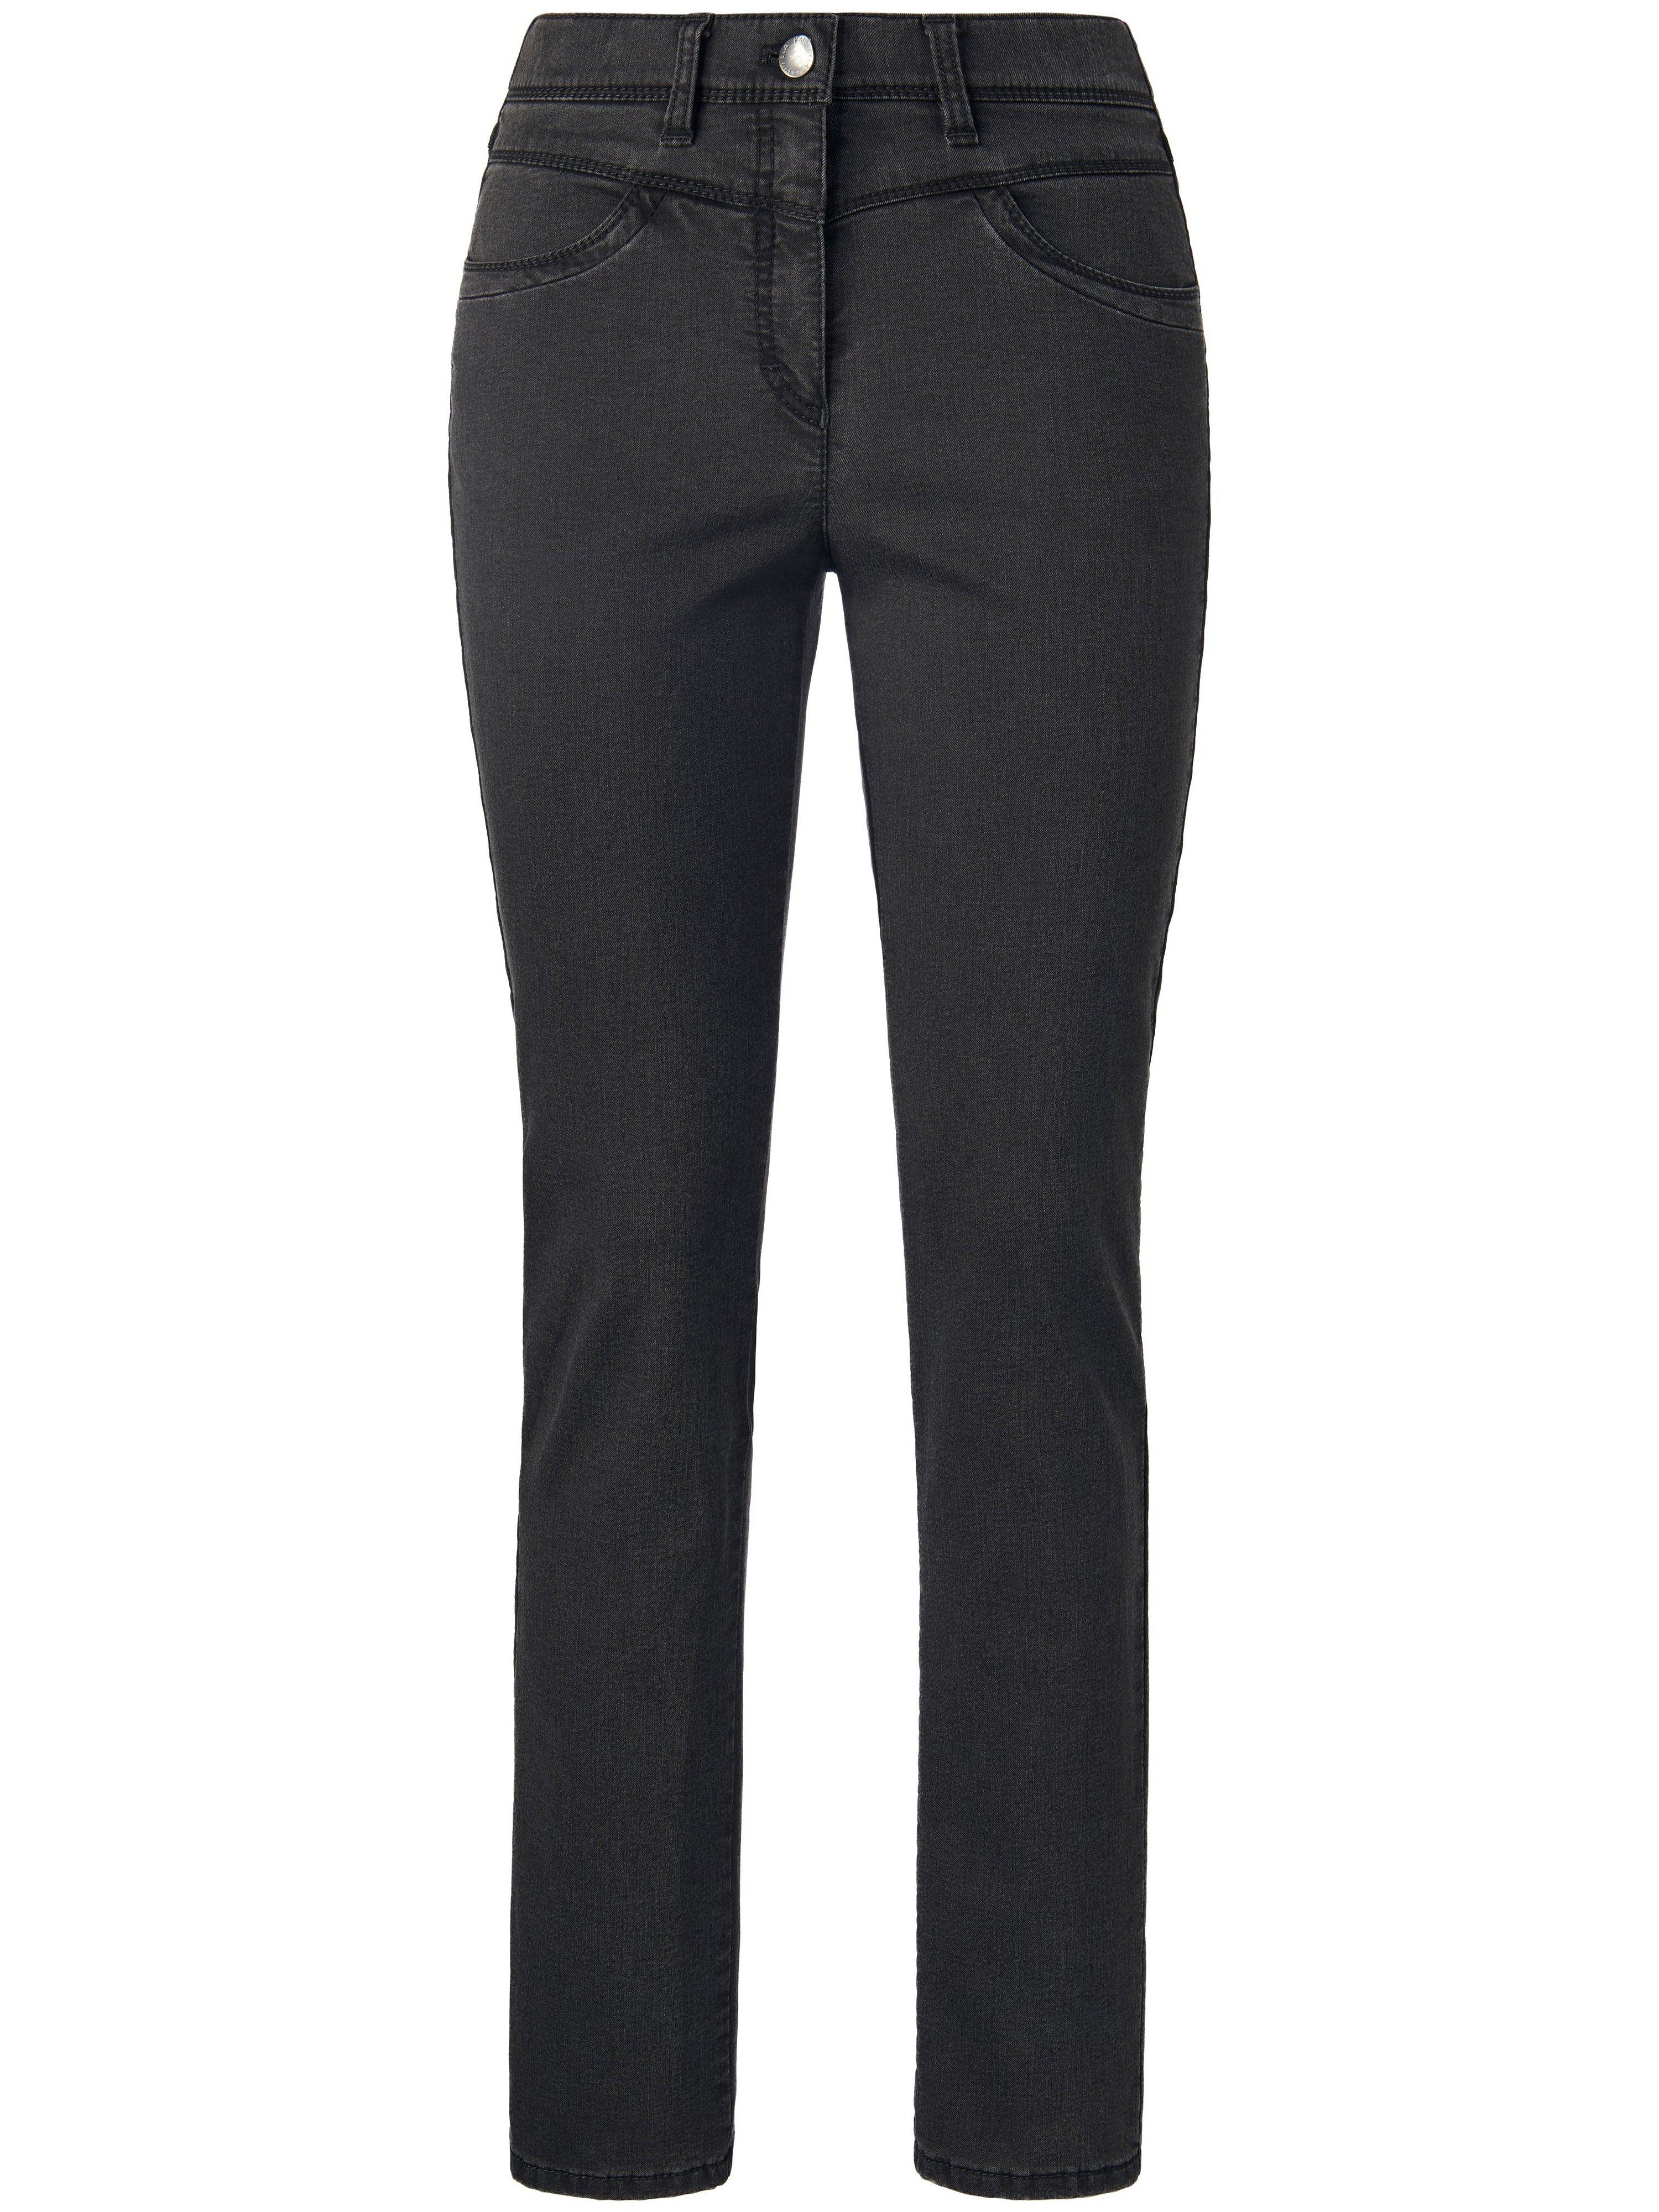 Super Slim-Thermolite-jeans model Laura New Van Raphaela by Brax denim